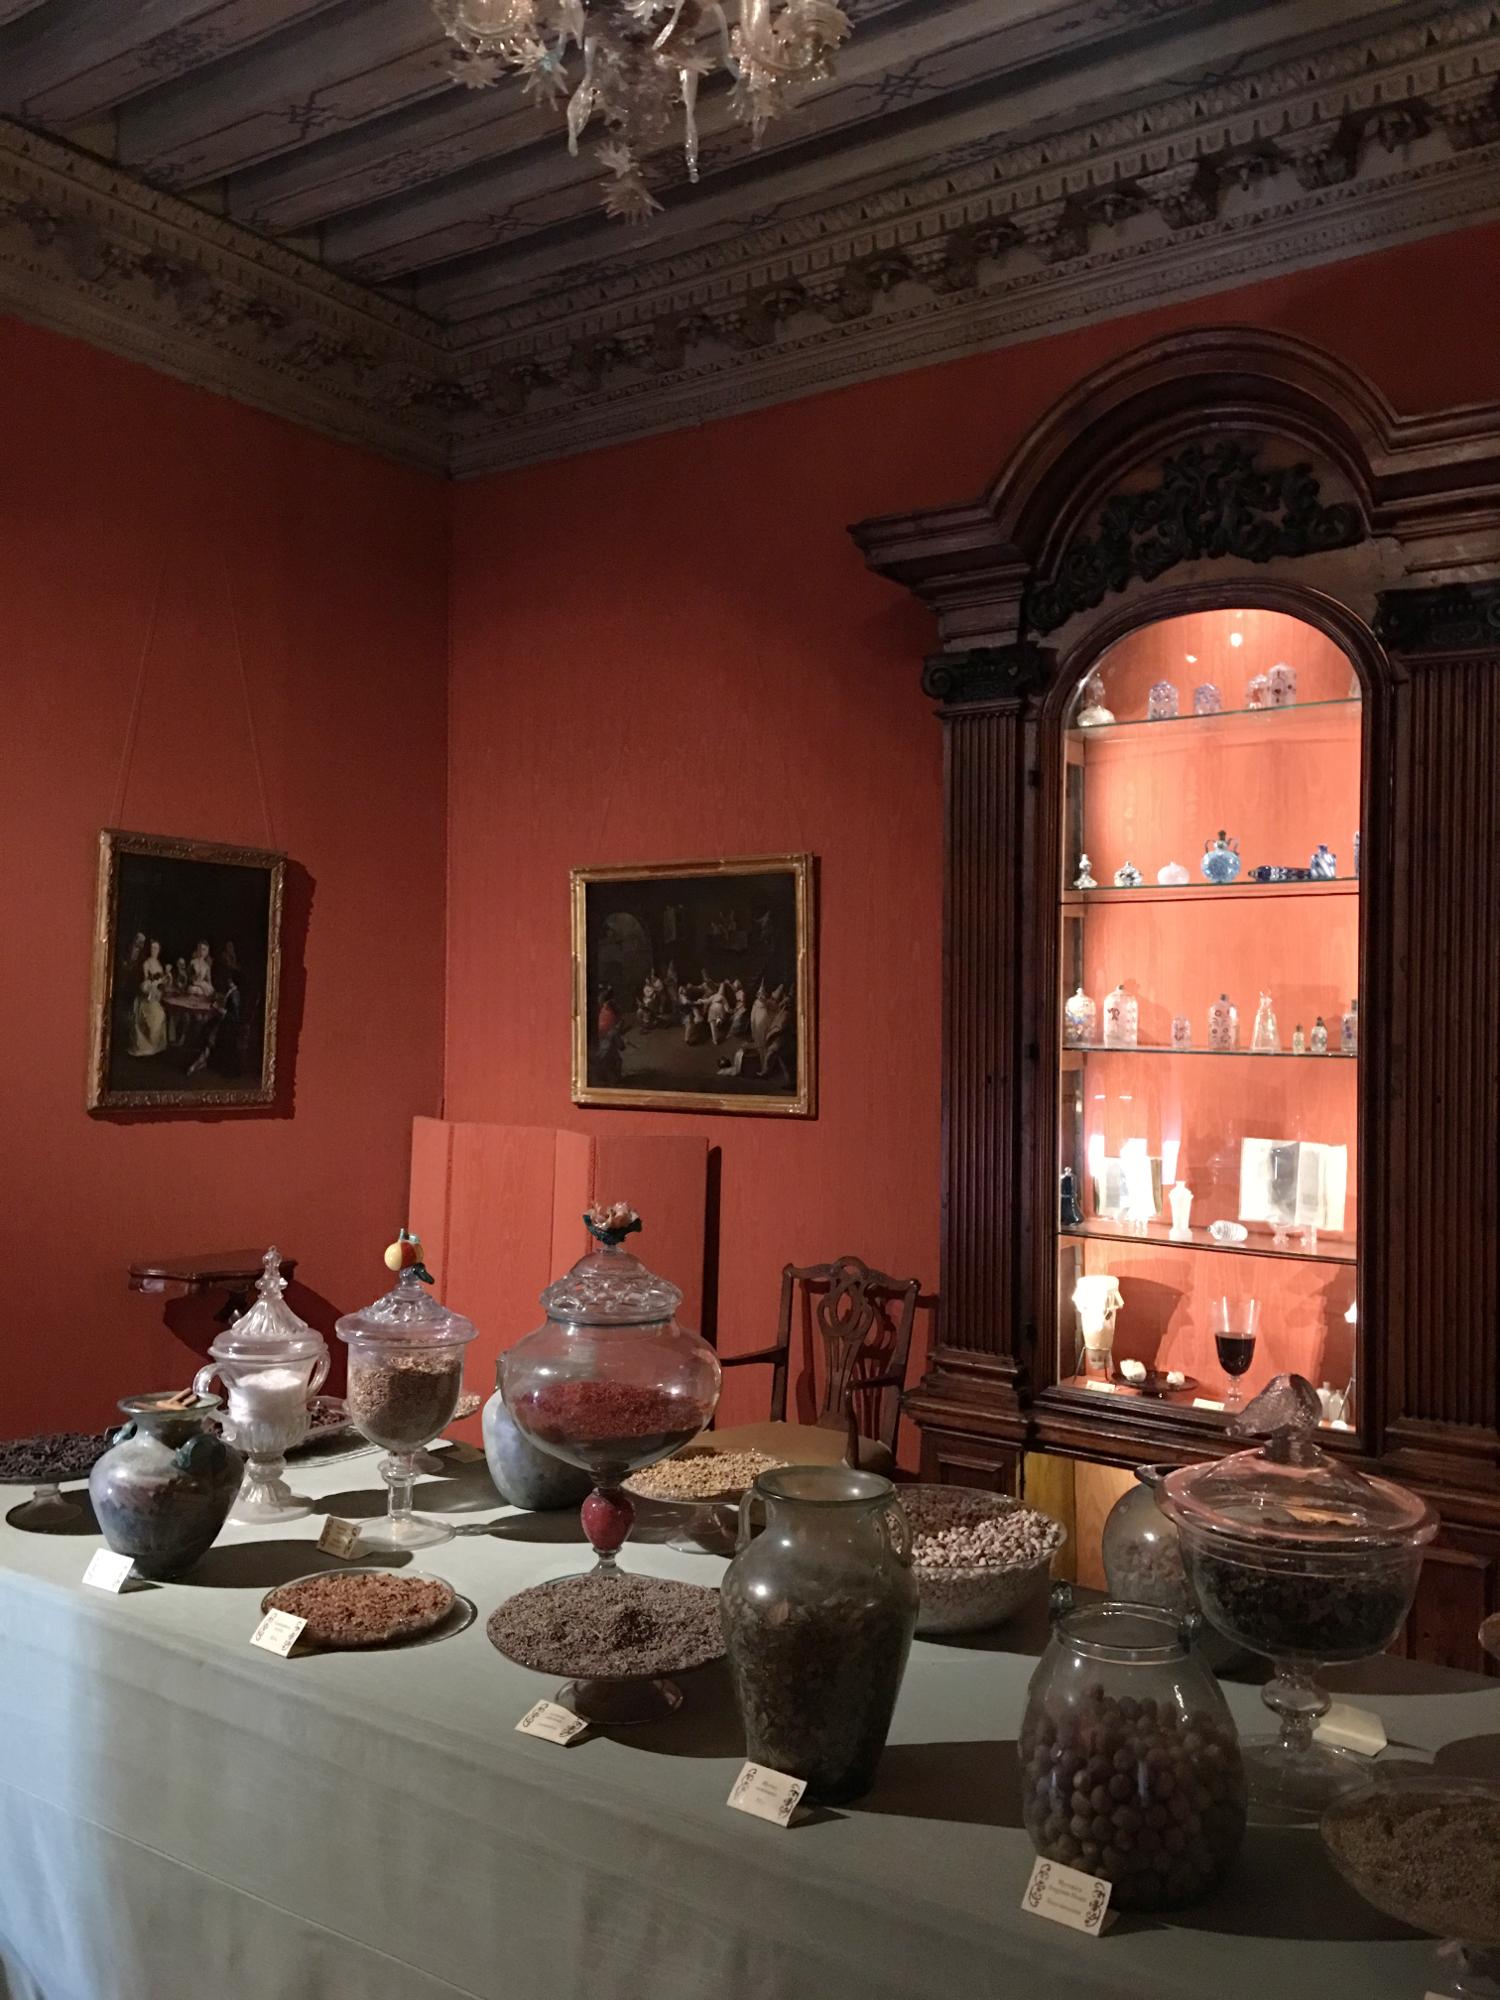 rocaille-blog-venezia-palazzo-mocenigo-percorso-profumo-mavive-vidal-65